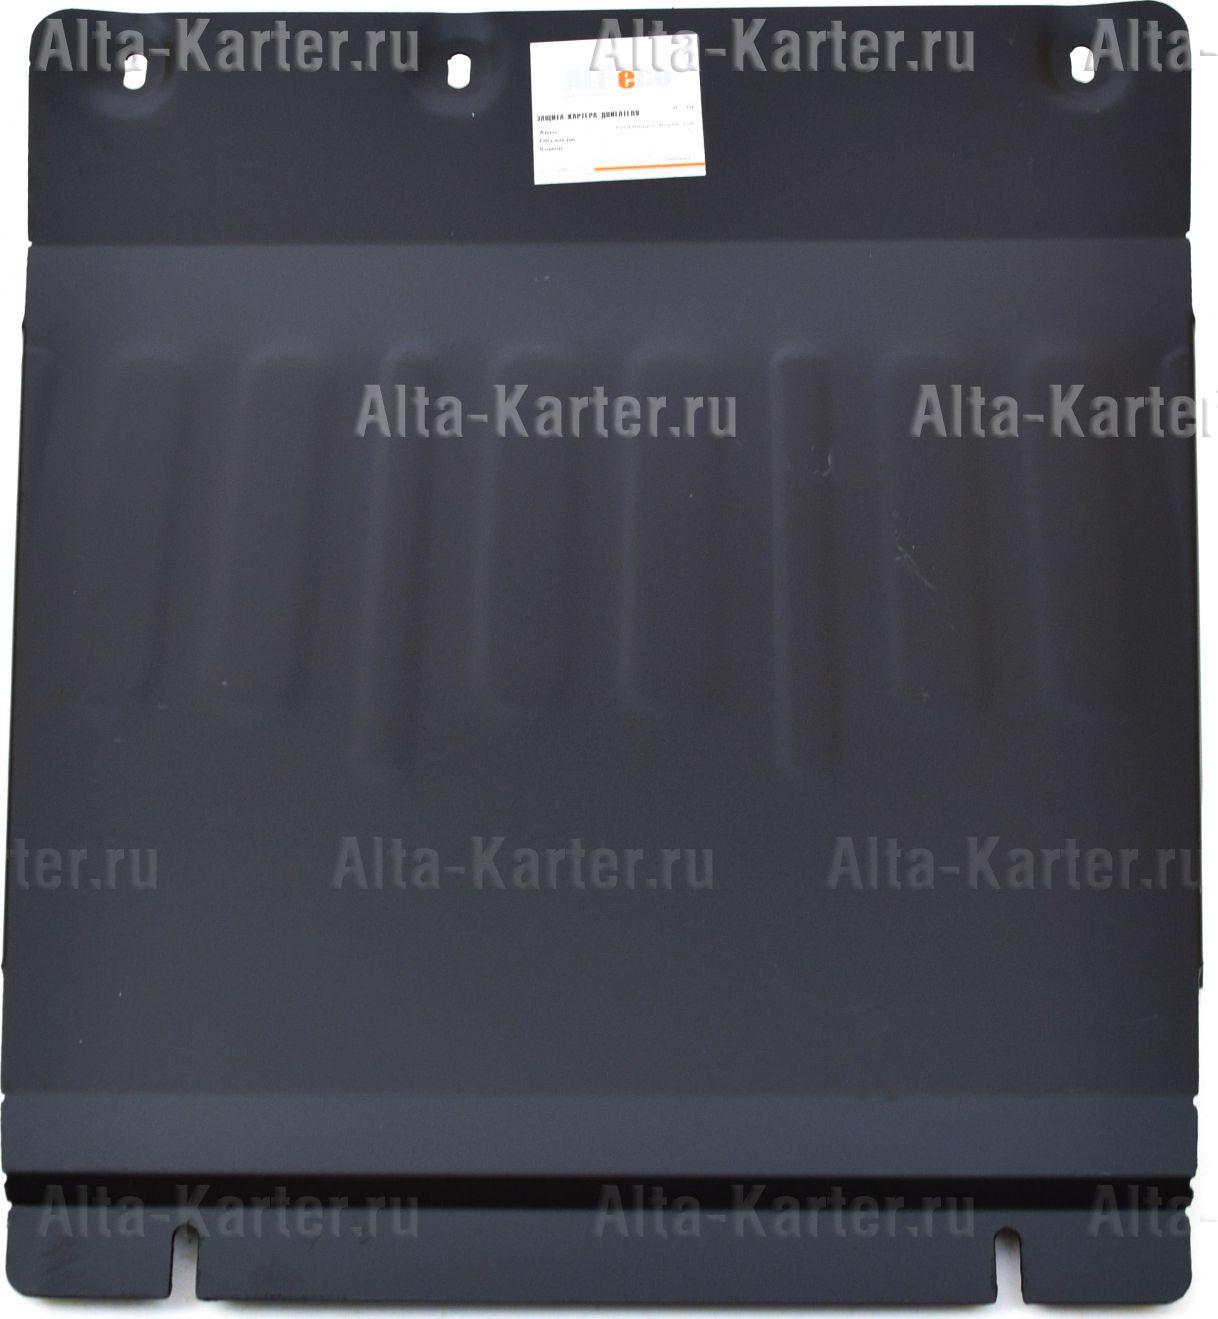 Защита Alfeco для КПП Ford Ranger IV Double Cab 2012-2021. Артикул ALF.07.30